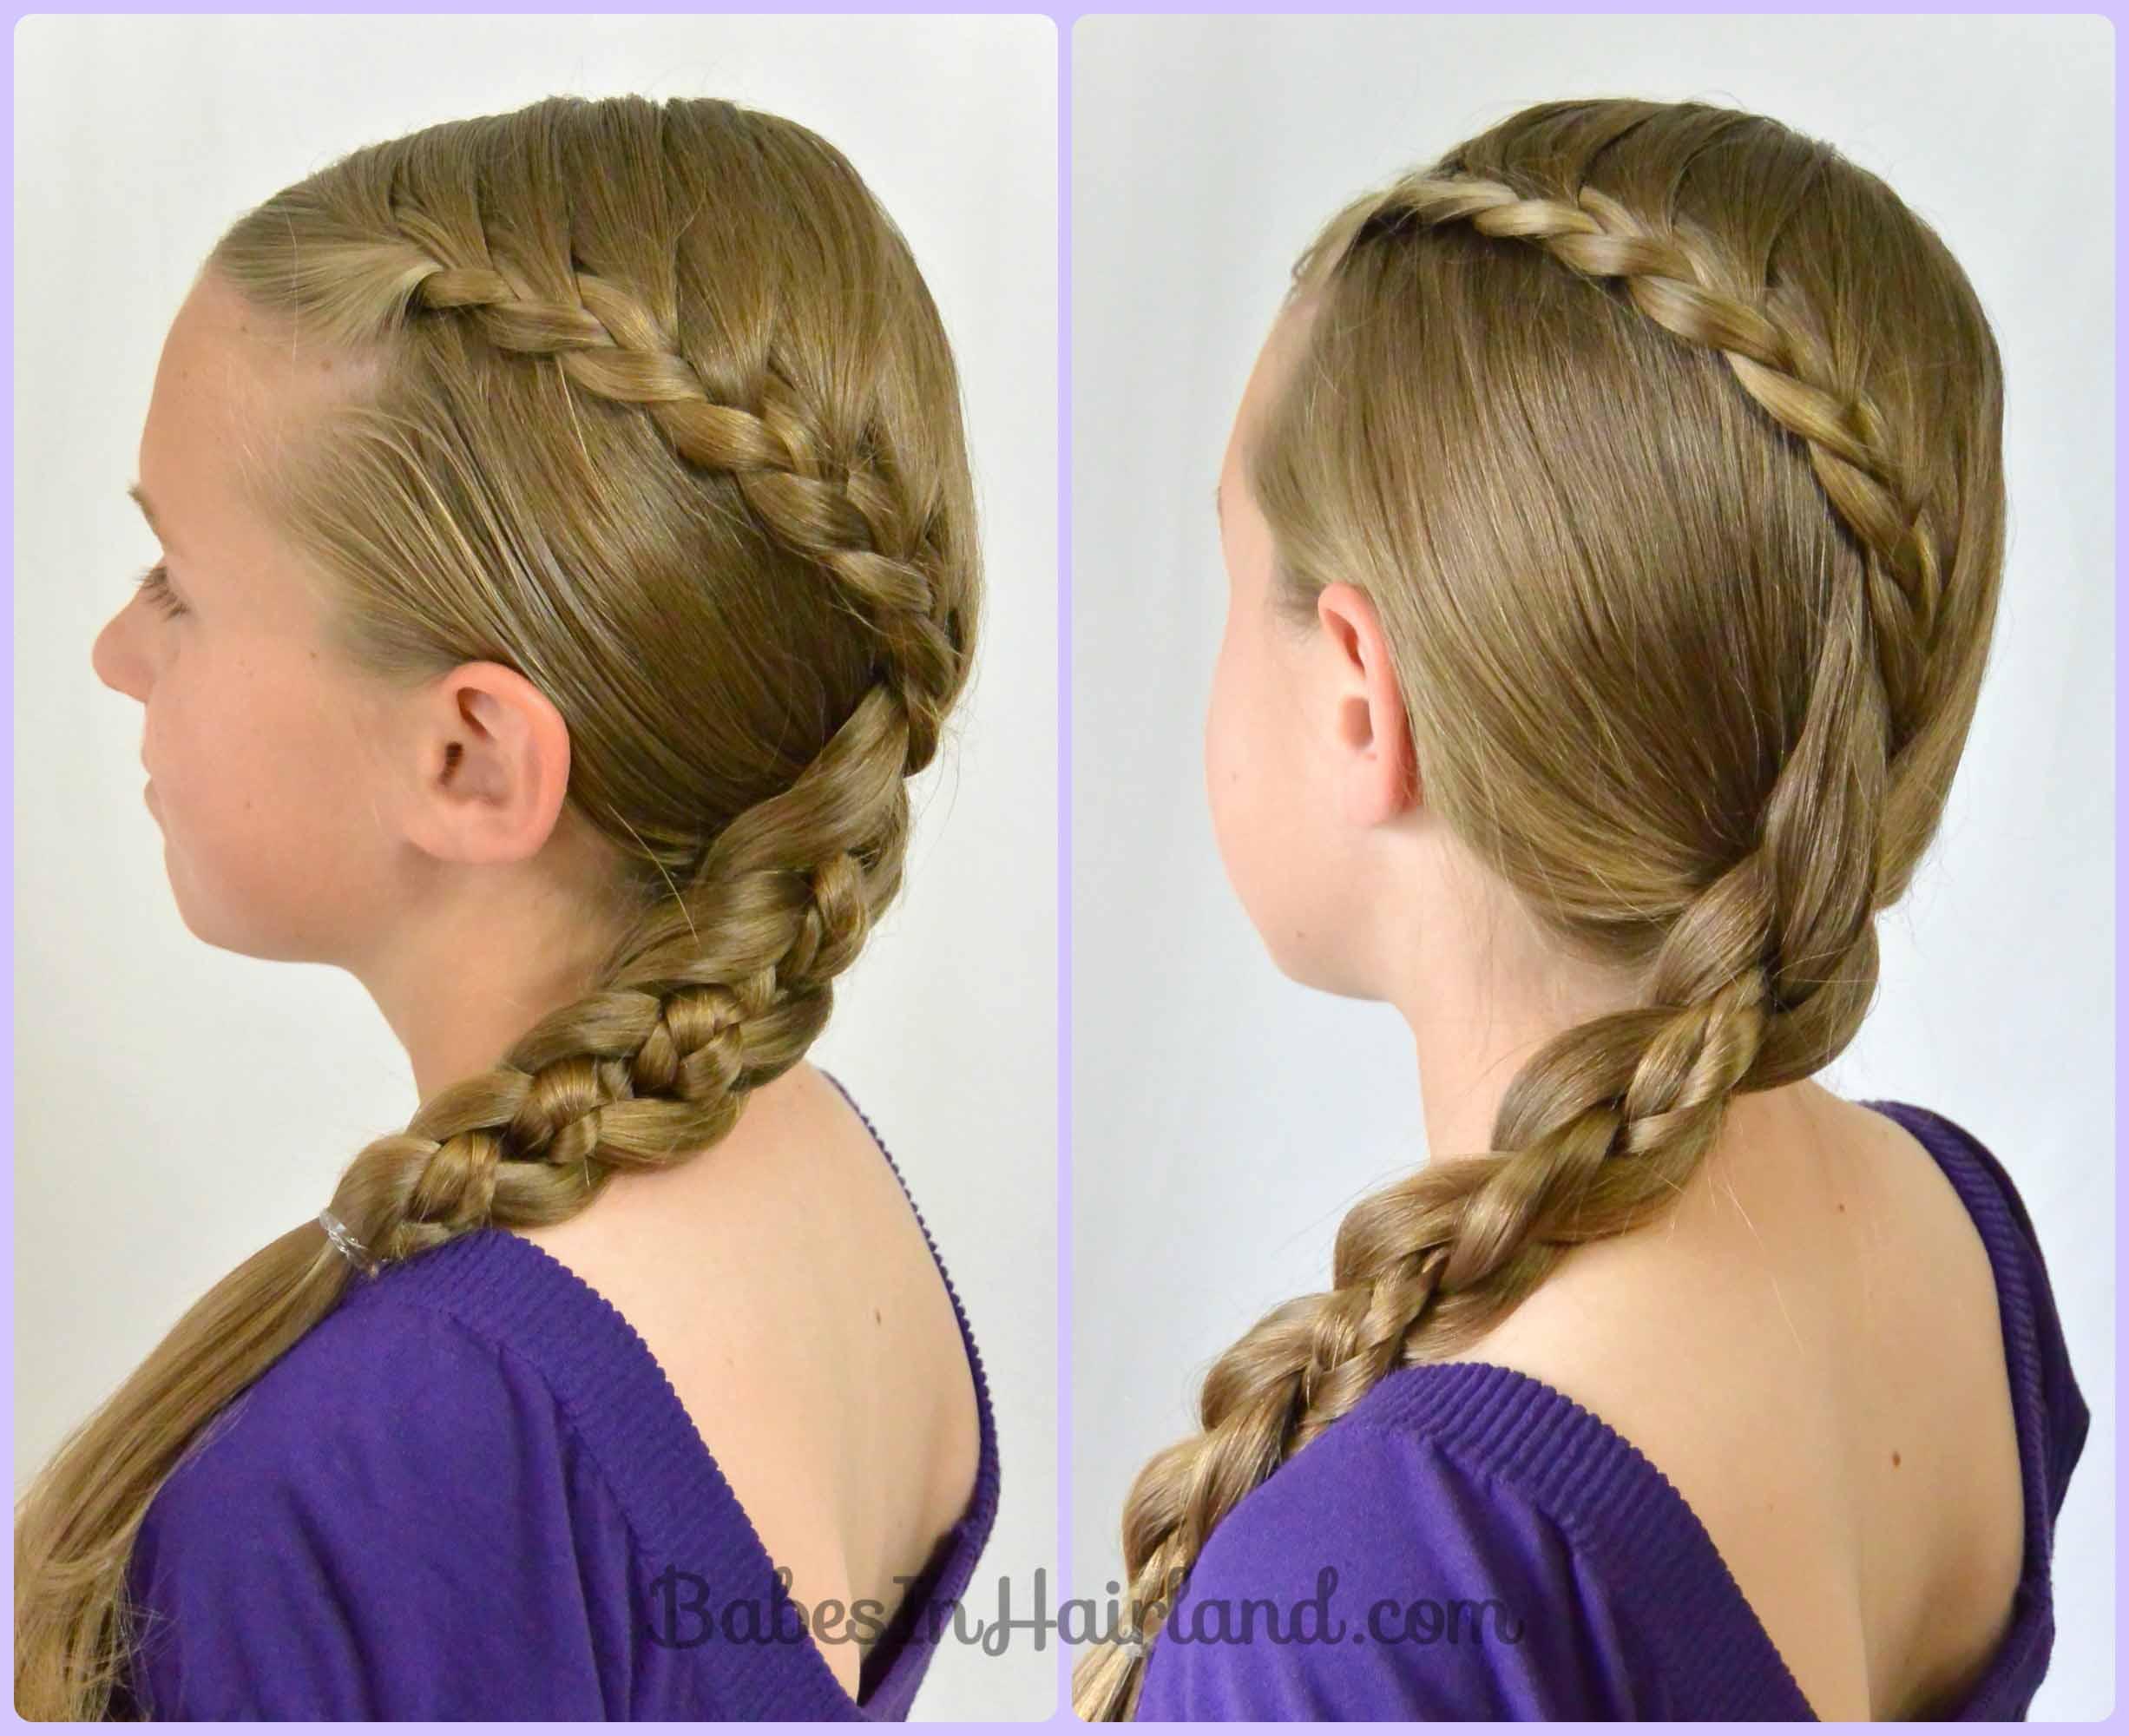 Enjoyable Lace Braid Into A 4 Strand Braid Babes In Hairland Short Hairstyles Gunalazisus